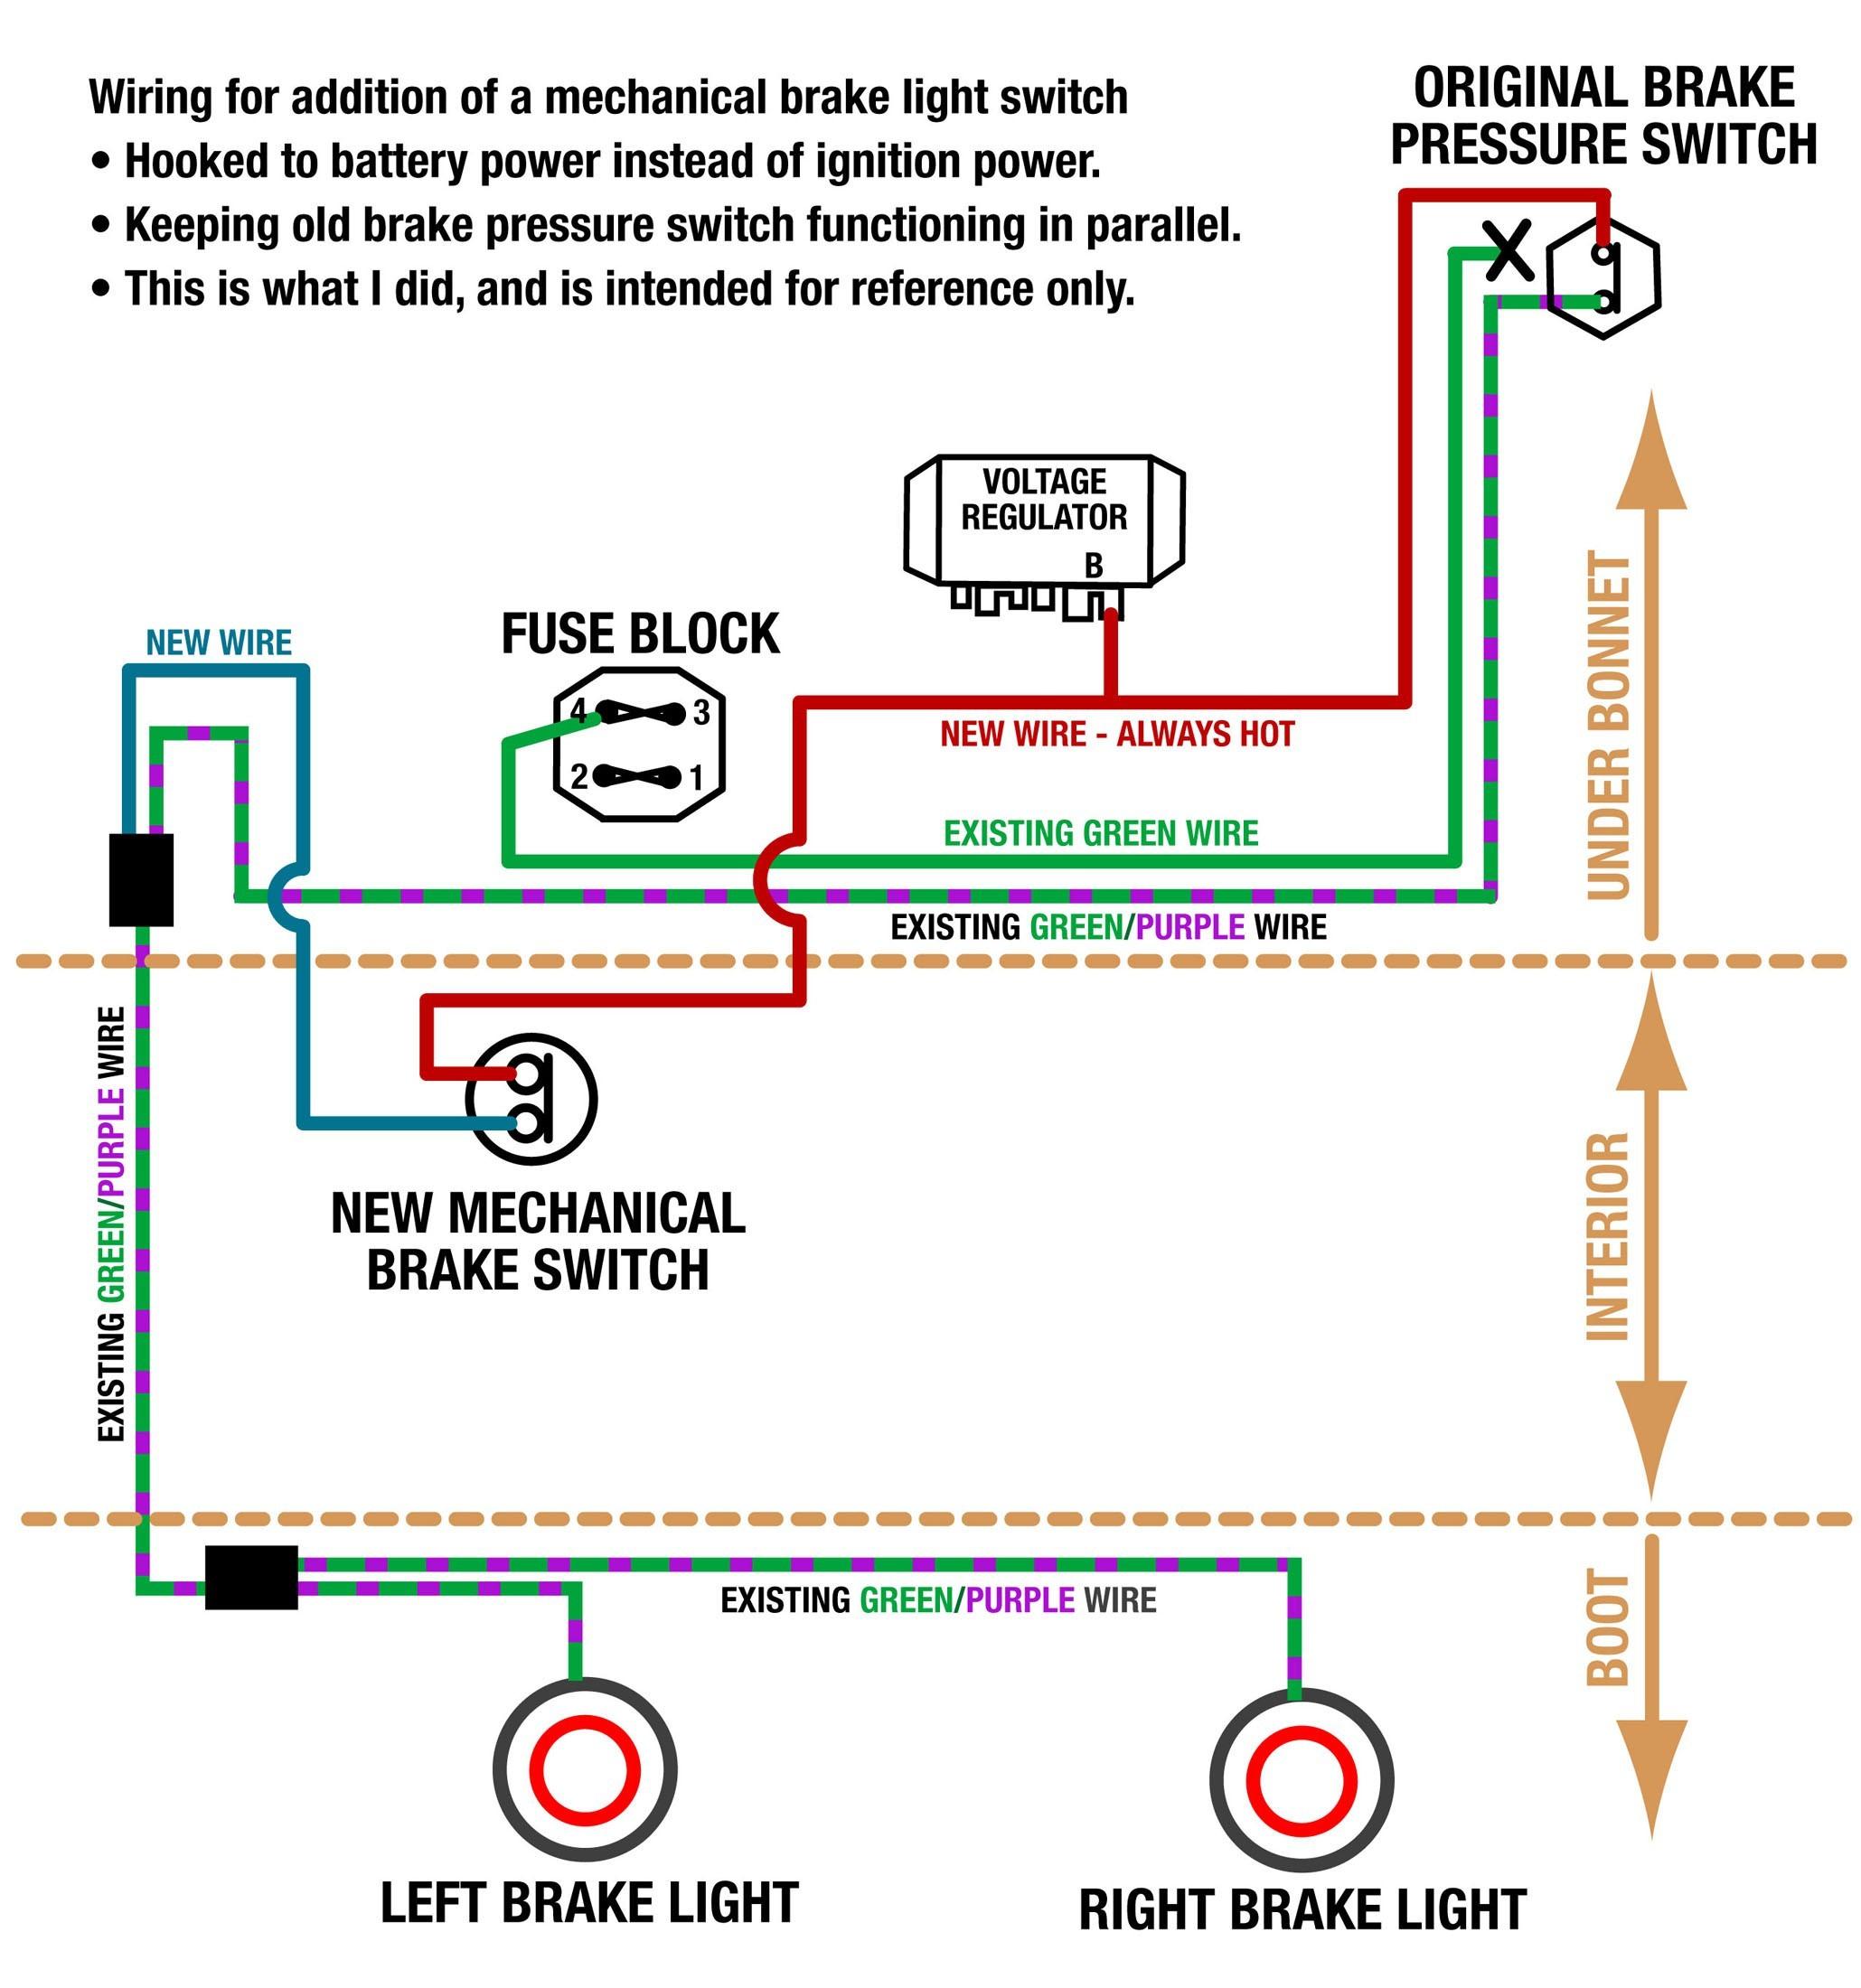 Brake Light Wiring Diagram Chevy Lovely Excellent Cj7 Headlight Switch Wiring Diagram Inspiration